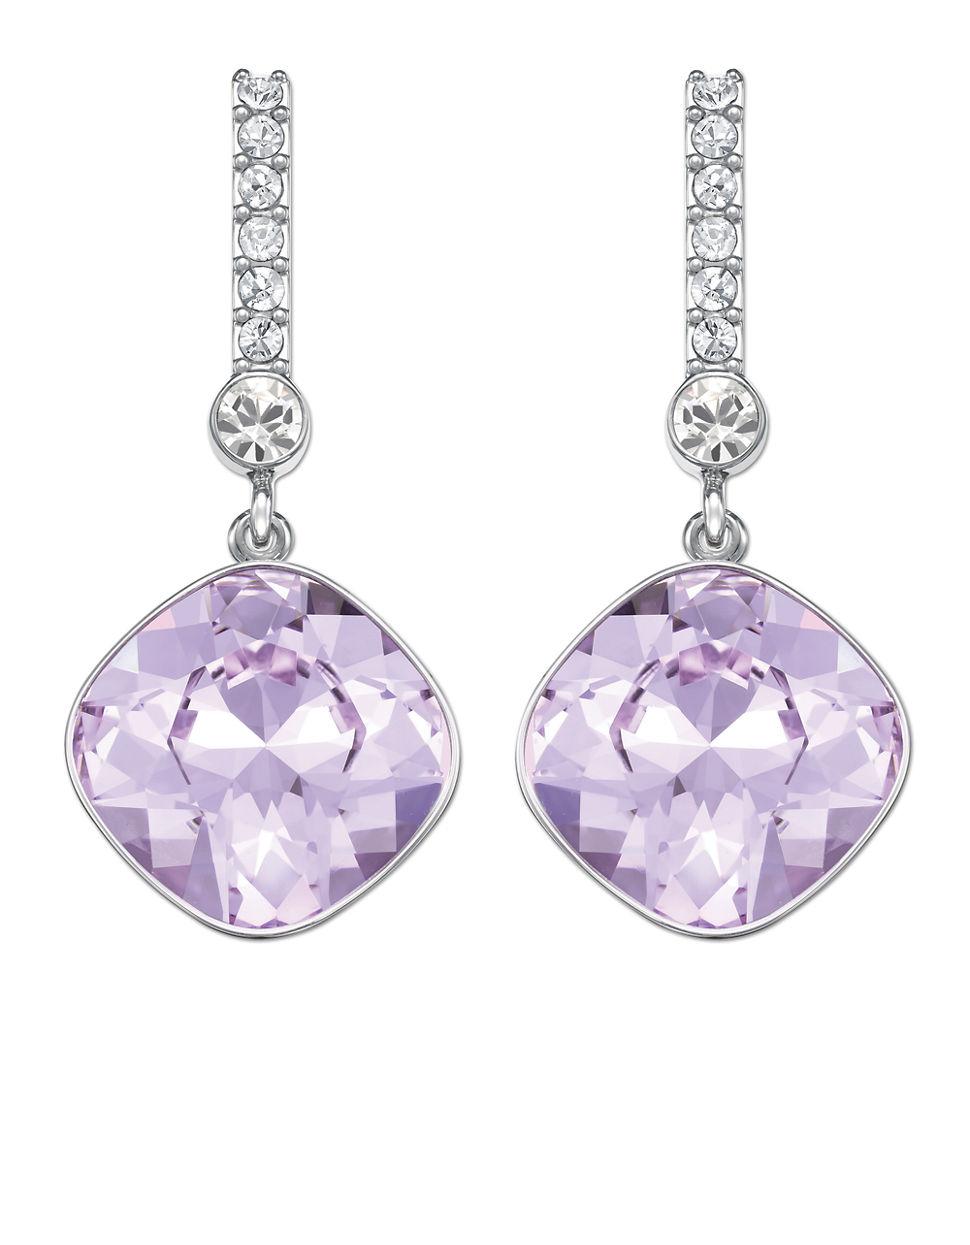 Swarovski Artisan Silvertone And Lilac Crystal Drop